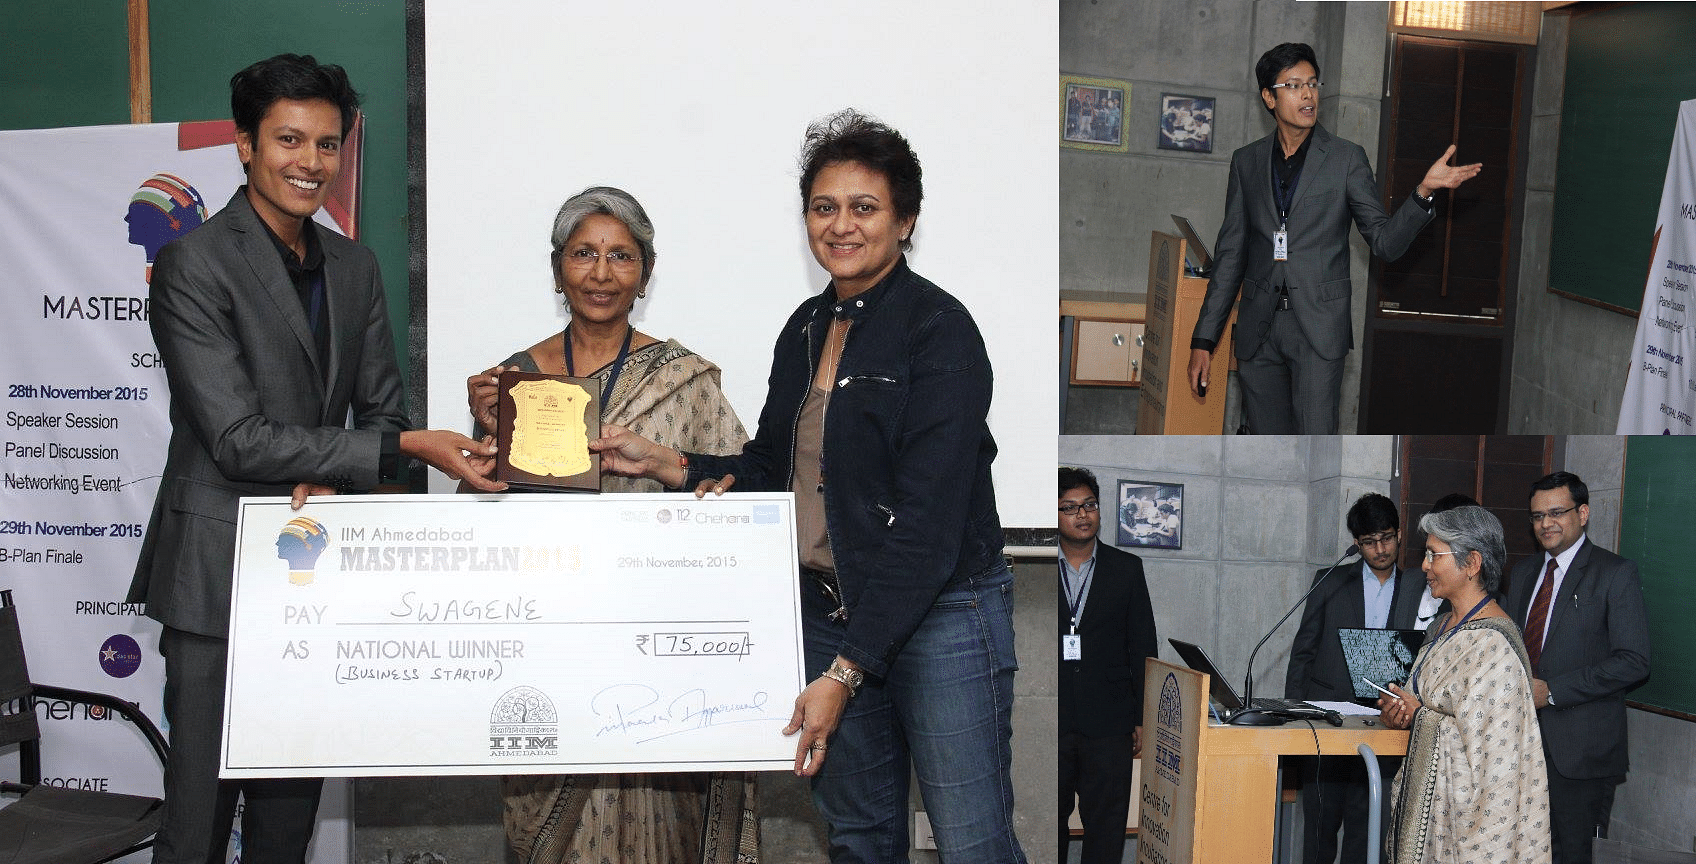 Swagene-wins-IIM-Ahmedabad-Masterplan-2015